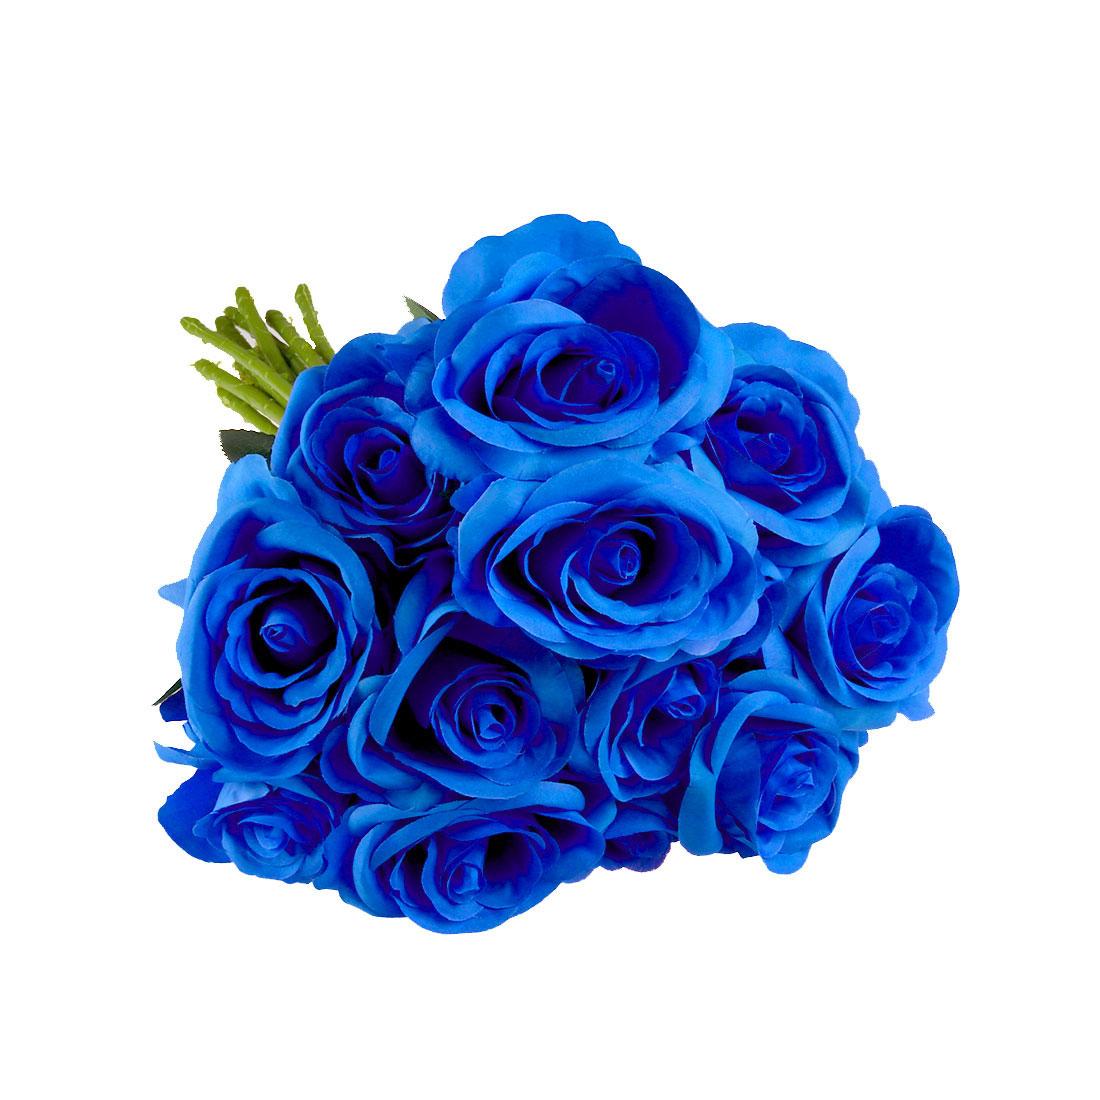 Artificial Silk Rose Flowers Rose Flower Bouquet Wedding Home Decor Blue 12pcs